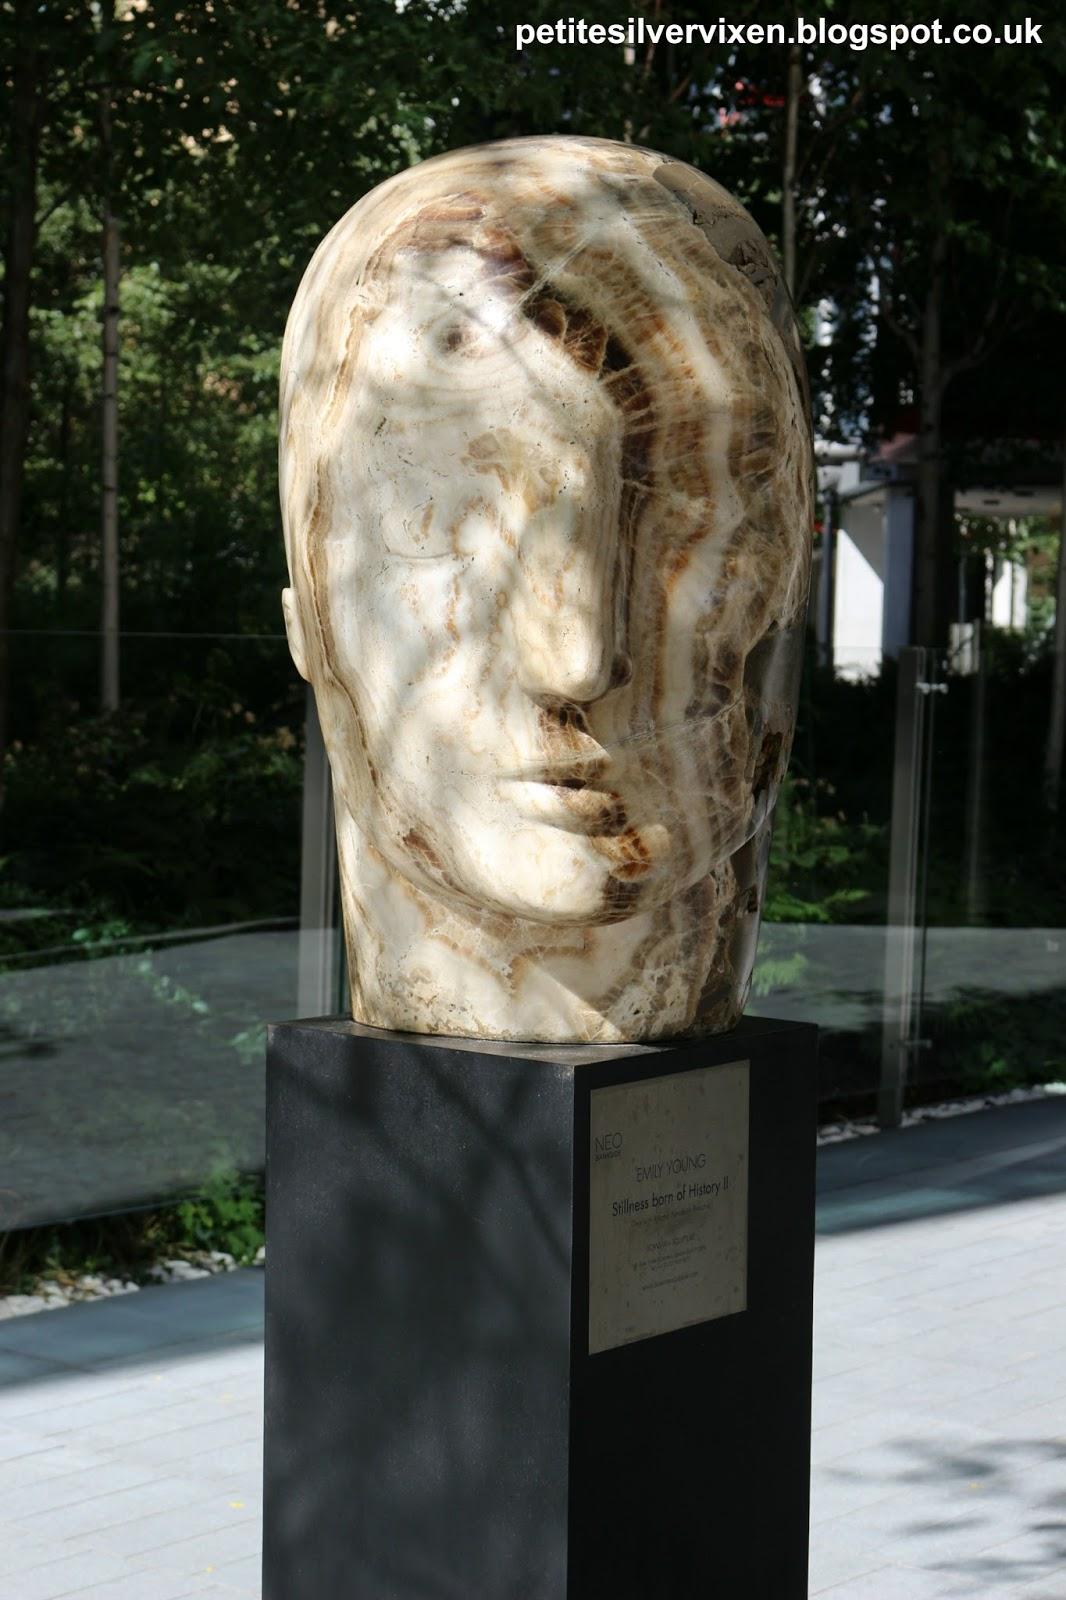 Emily Young Sculpture | Petite Silver Vixen